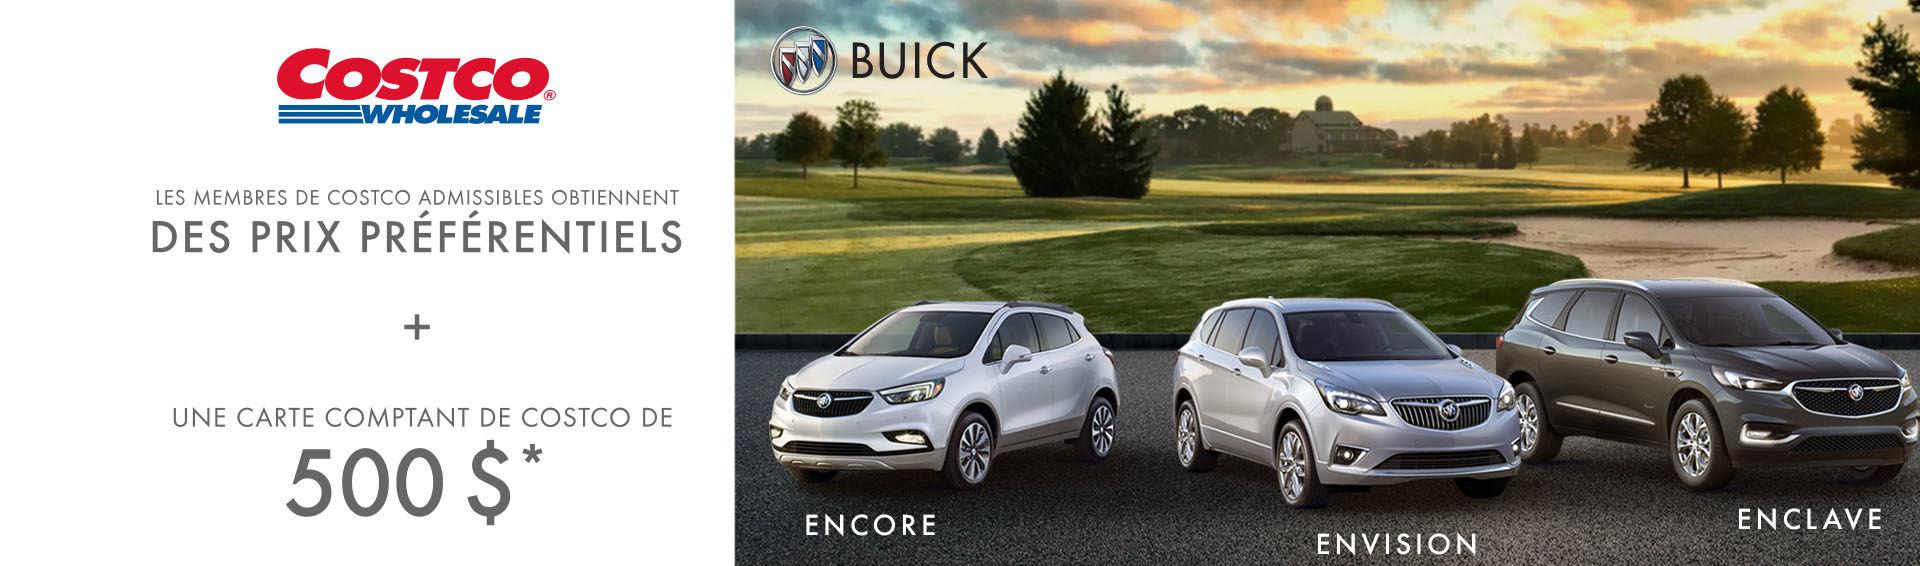 Promotion Buick Juillet